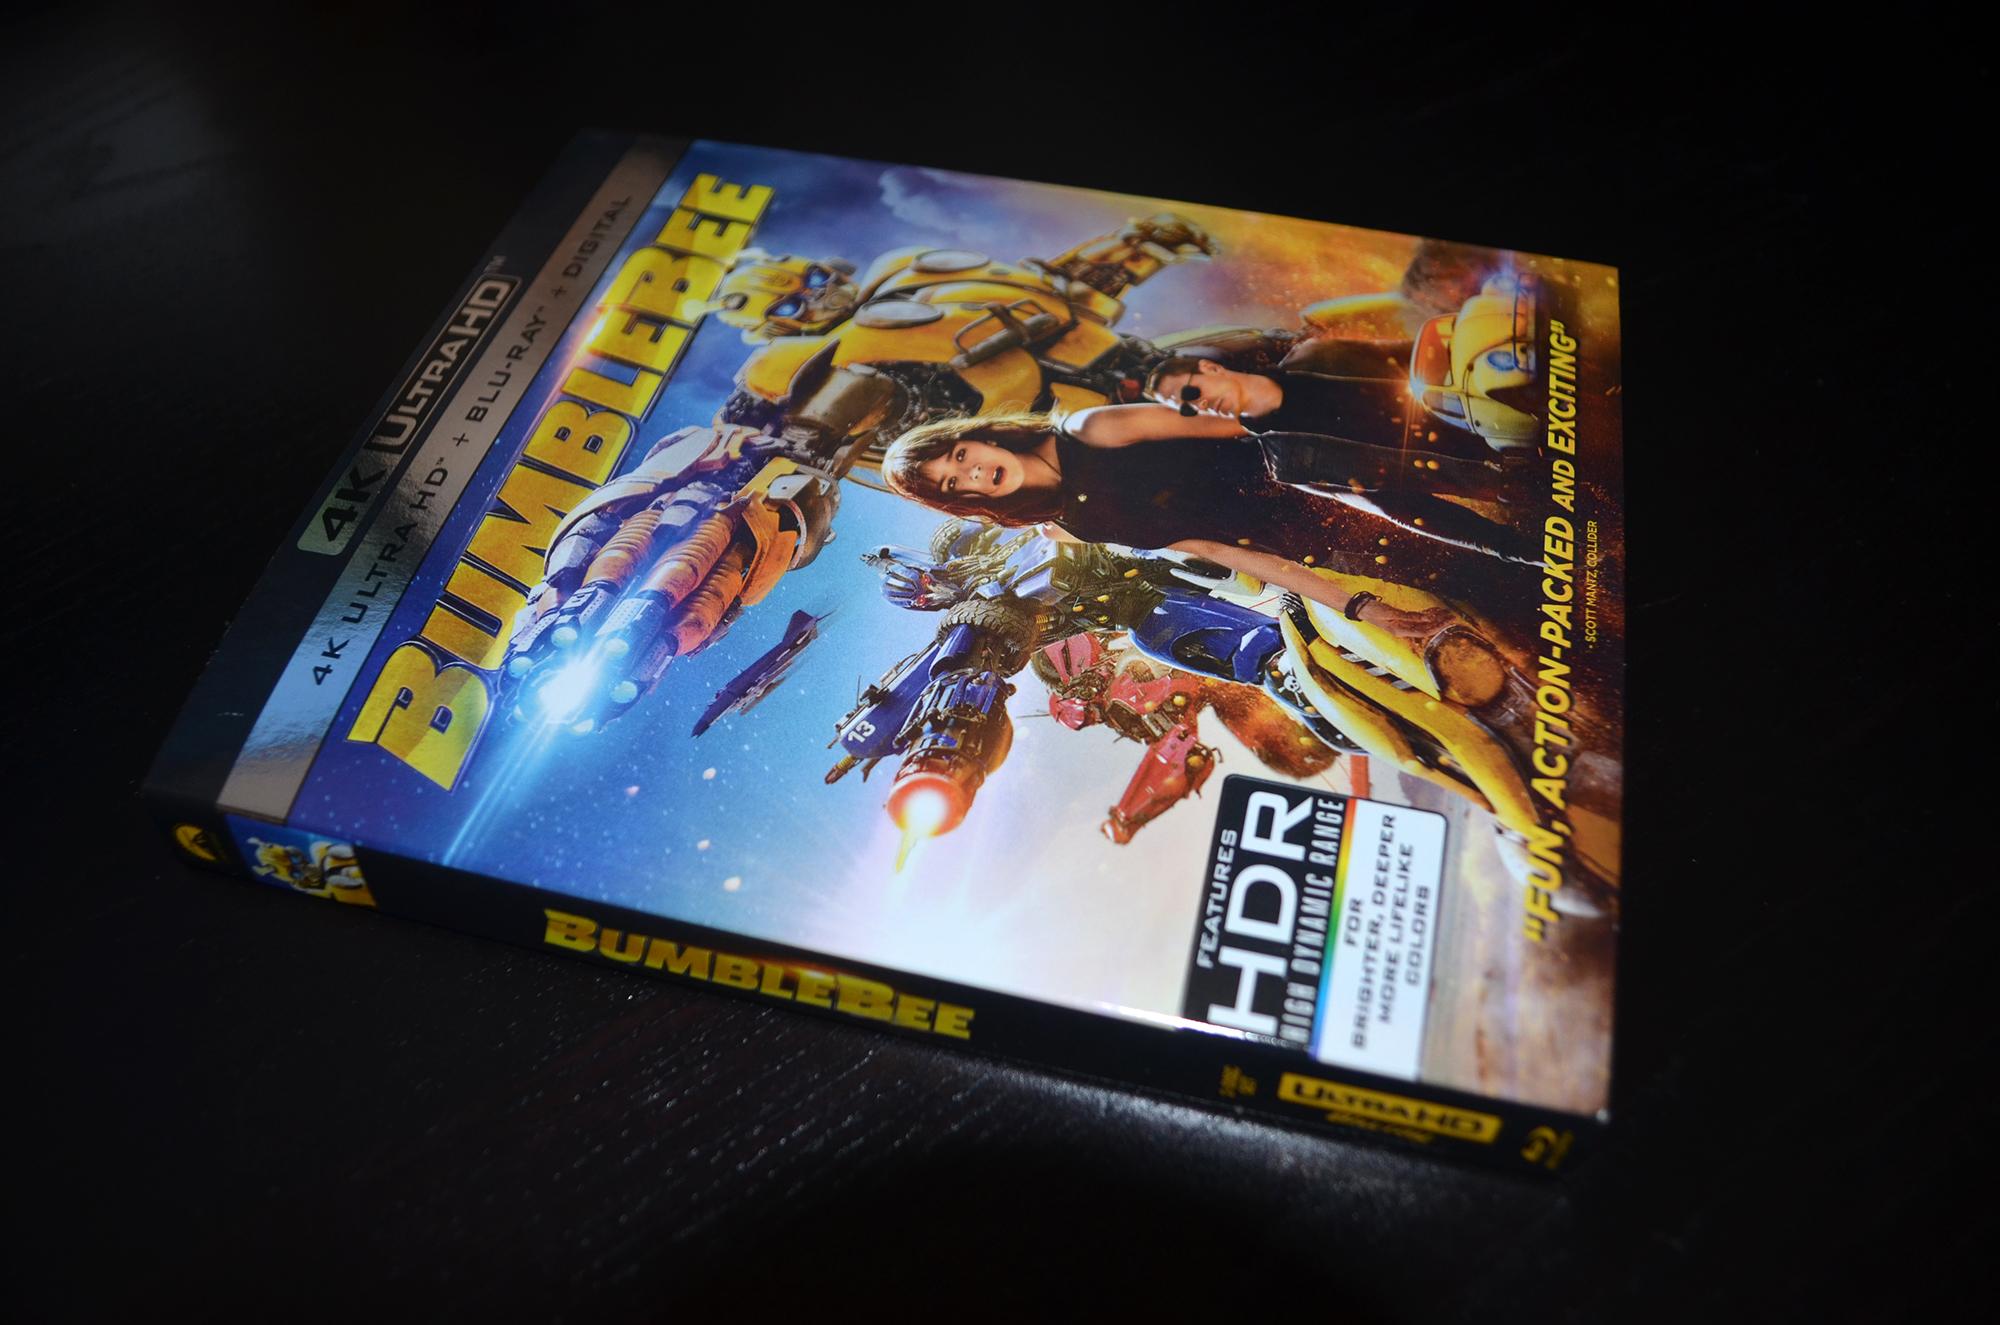 Bumblebee 4K Review